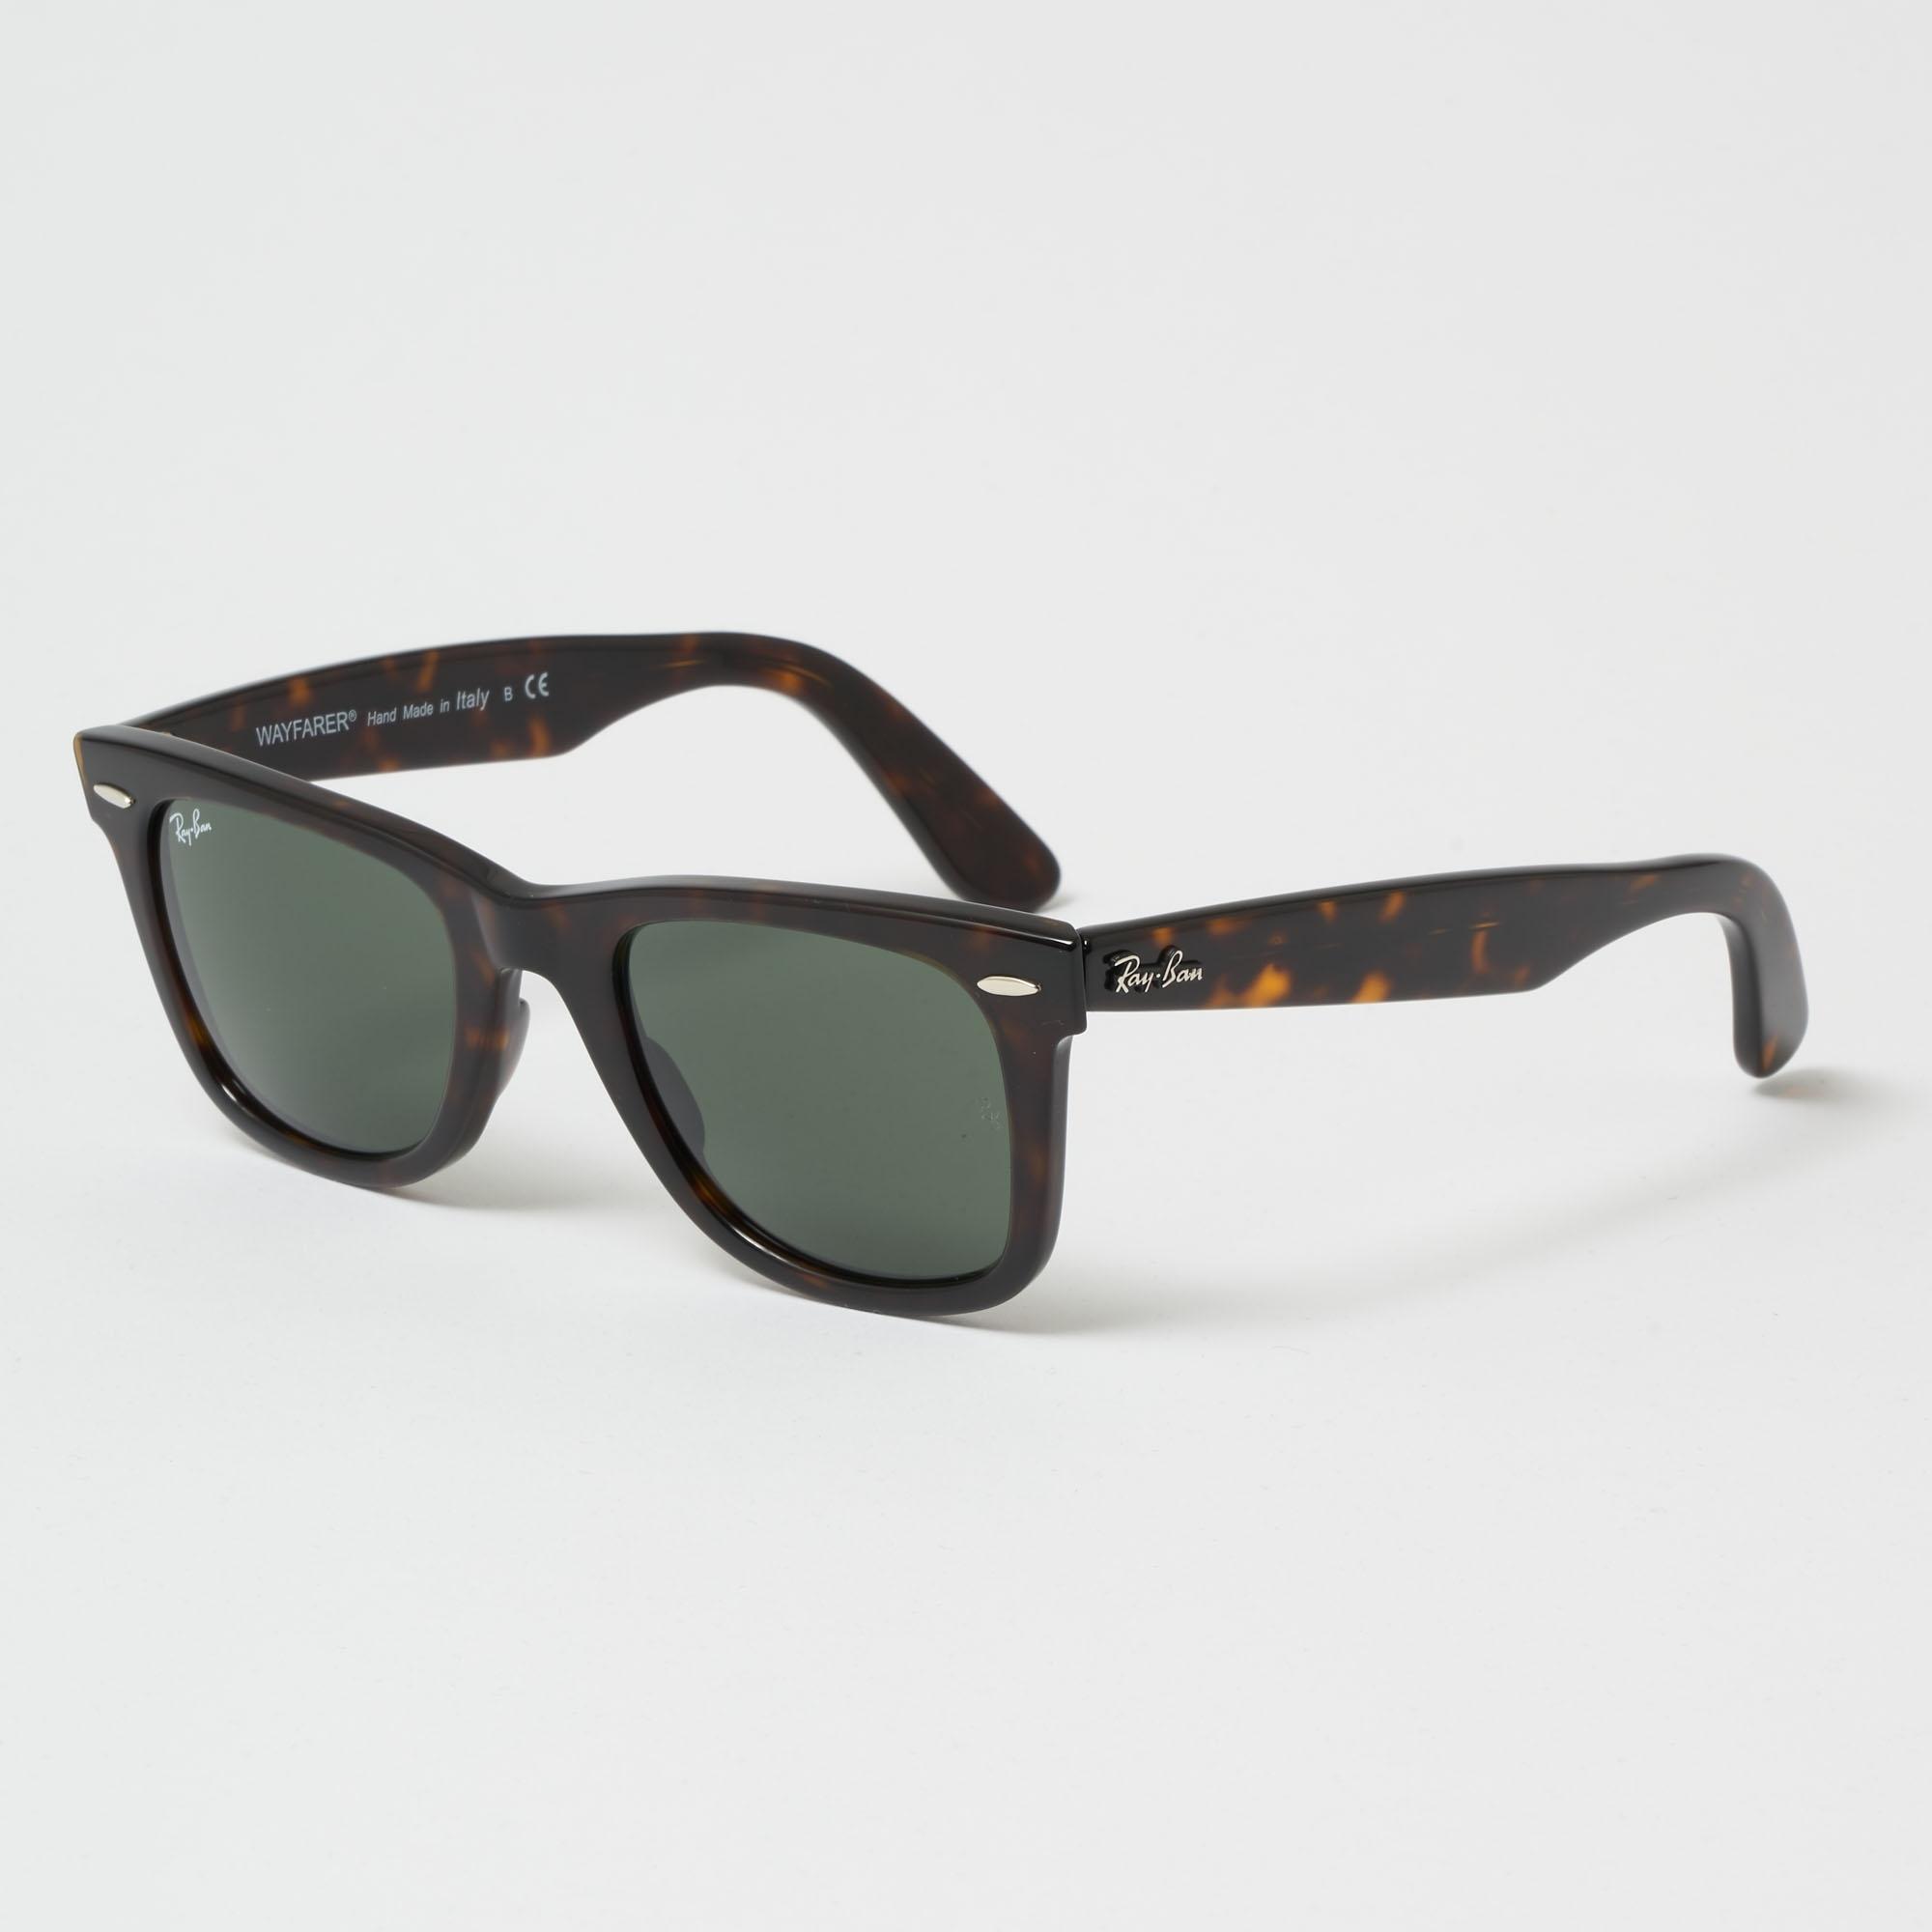 d88c909d4b Tortoise Original Wayfarer Classic Sunglasses - Green Classic G-15 Lenses